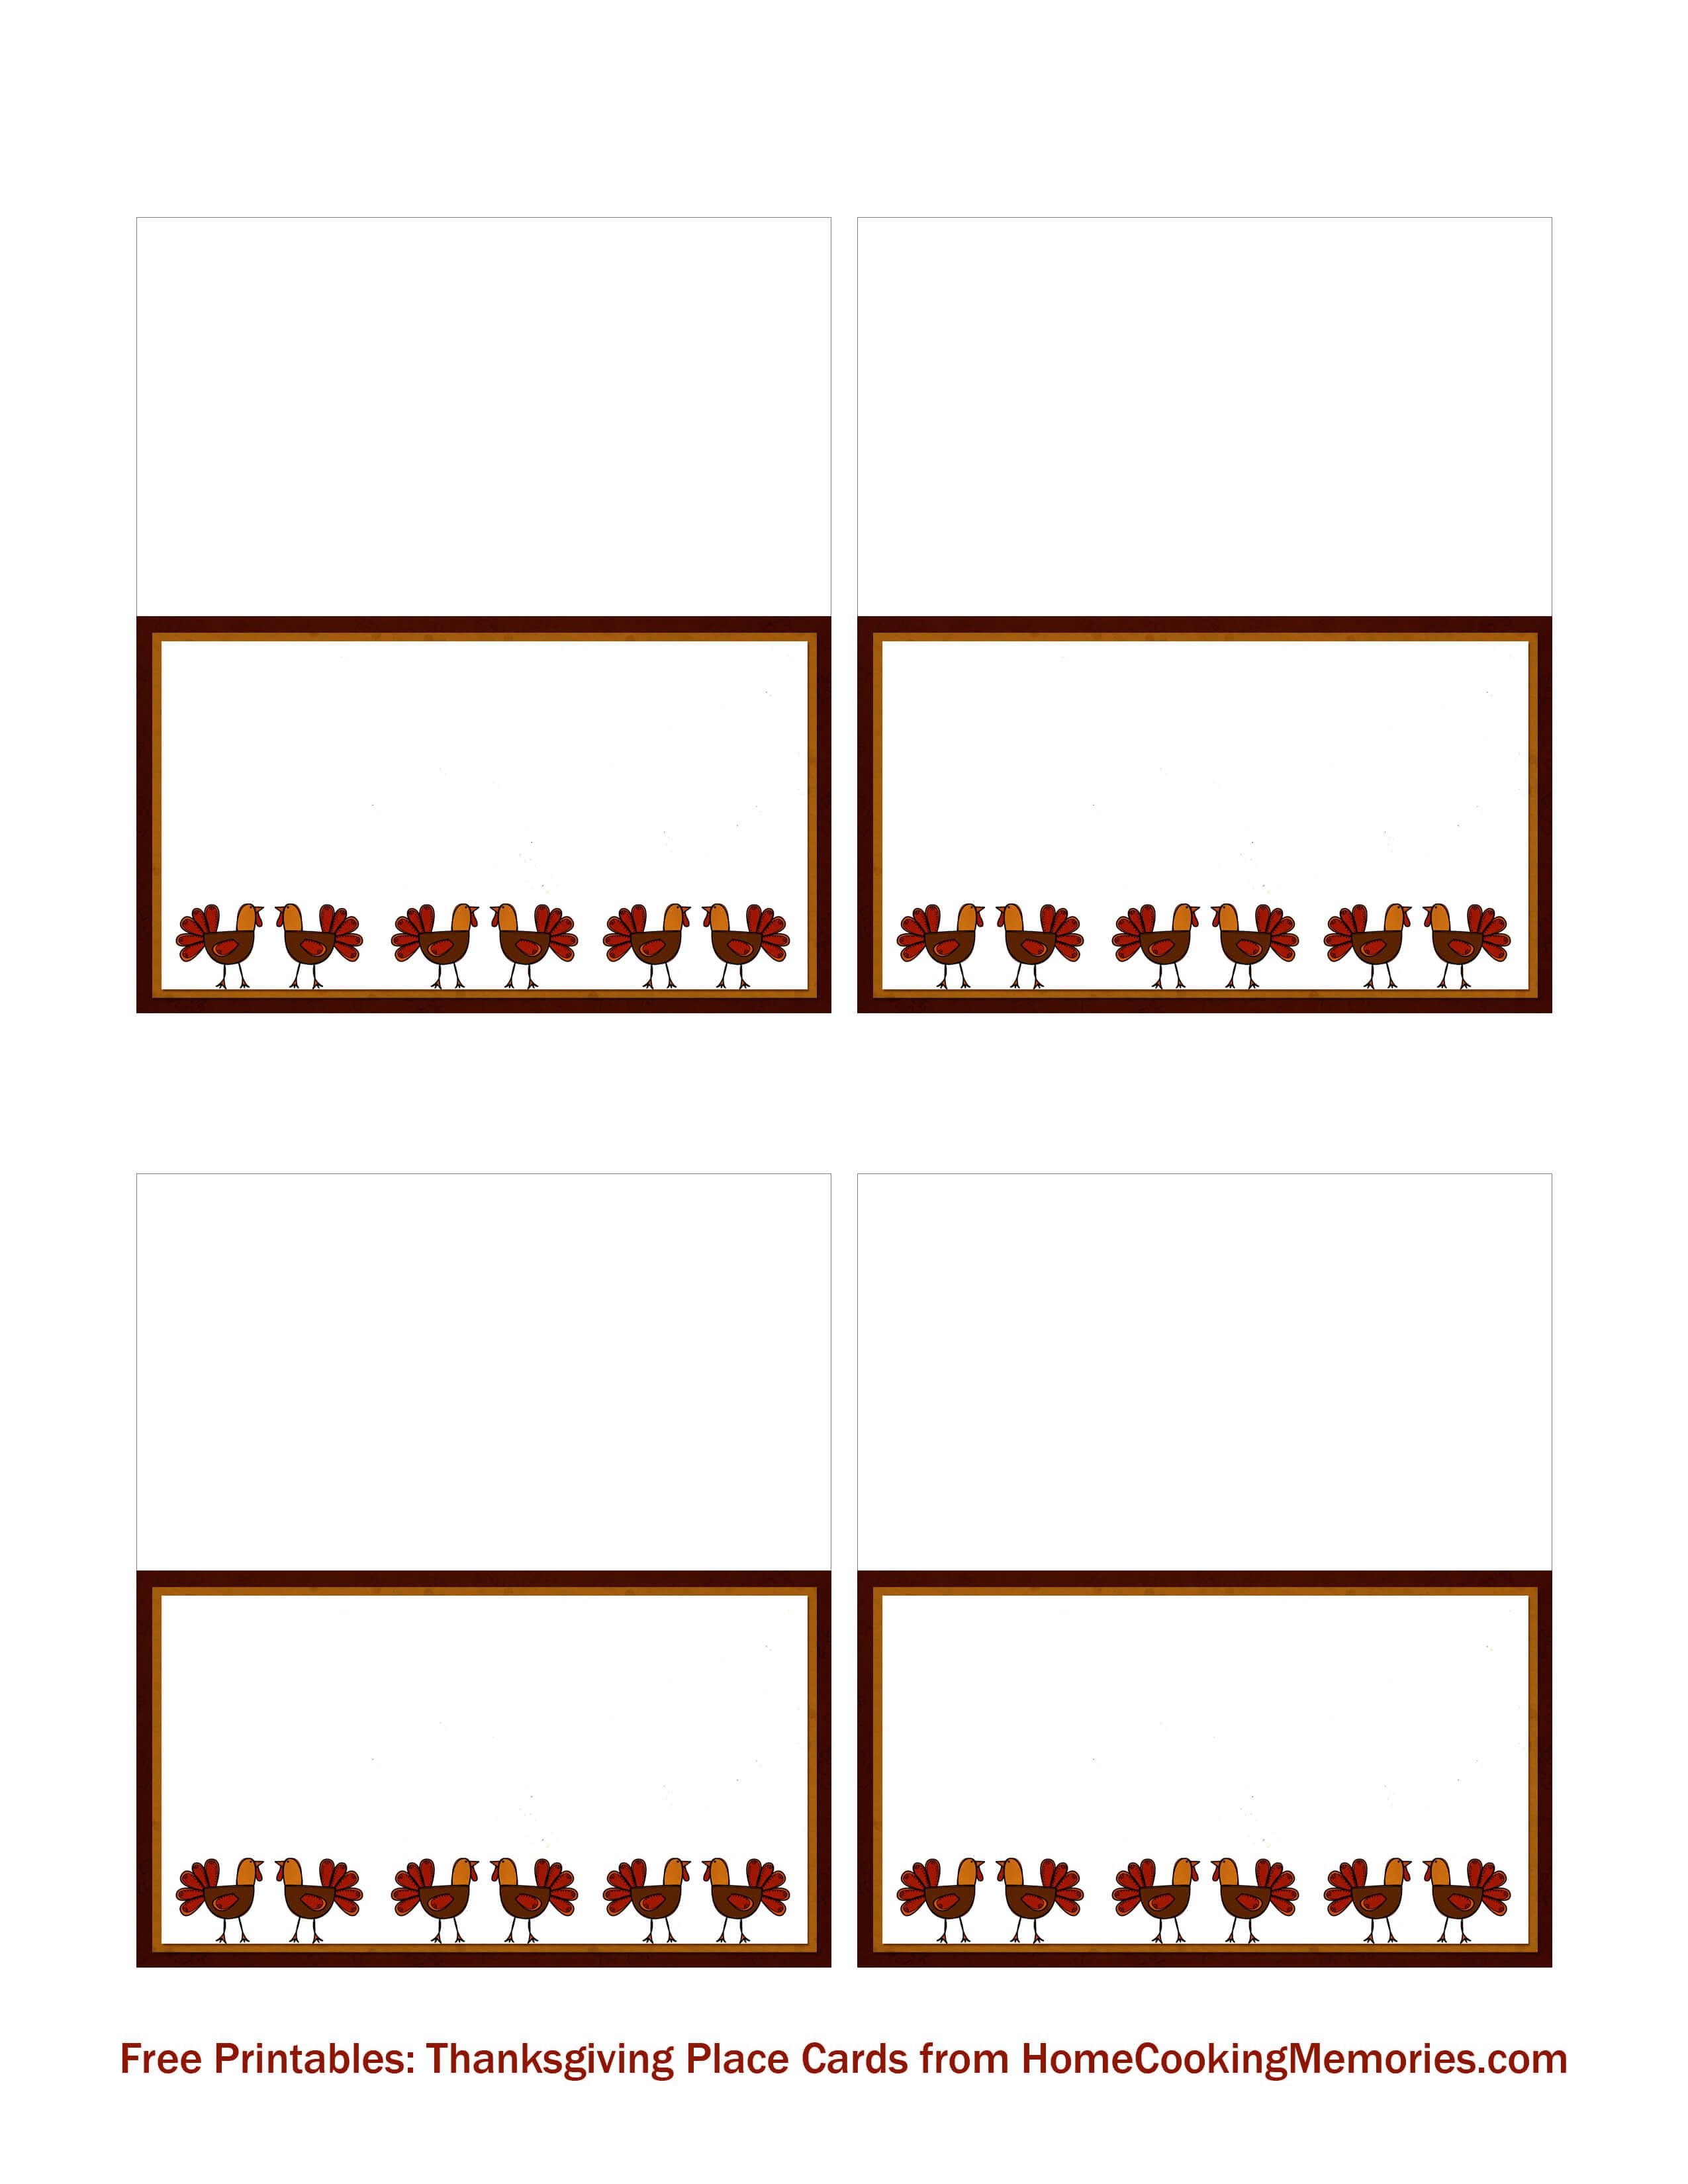 Place Card Template 6 Per Sheet | Meetpaulryan In Place Card Template 6 Per Sheet